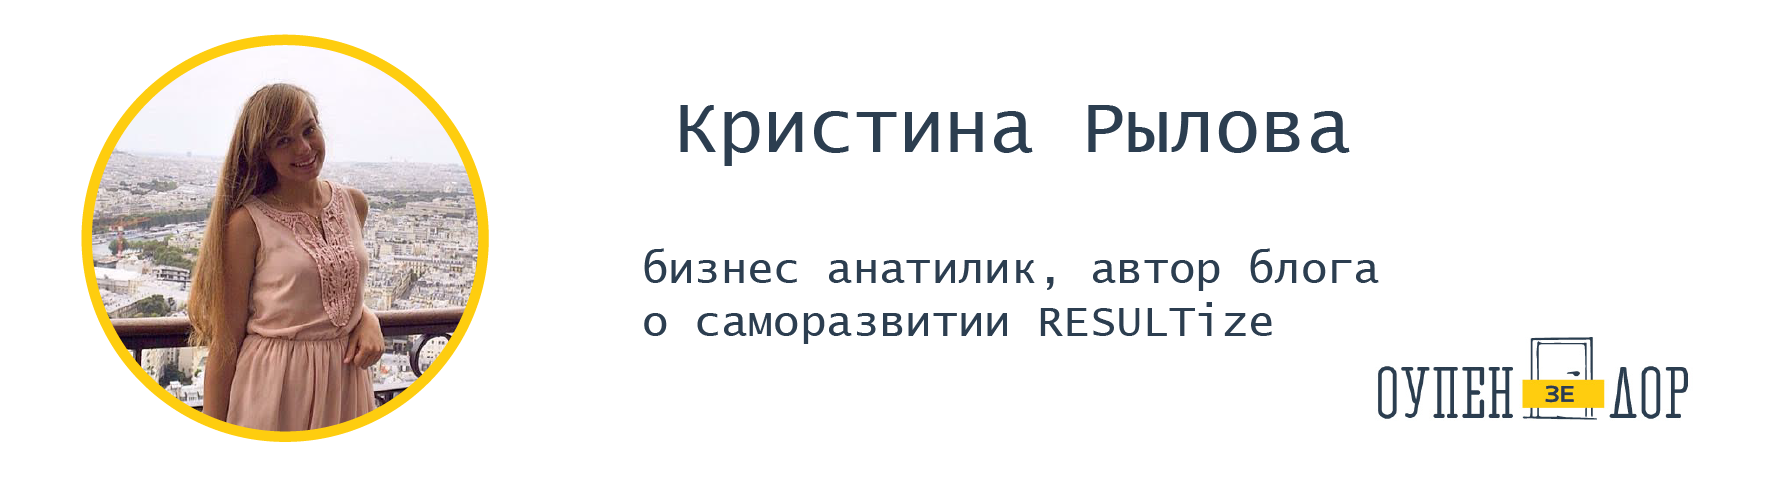 Кристина Рылова